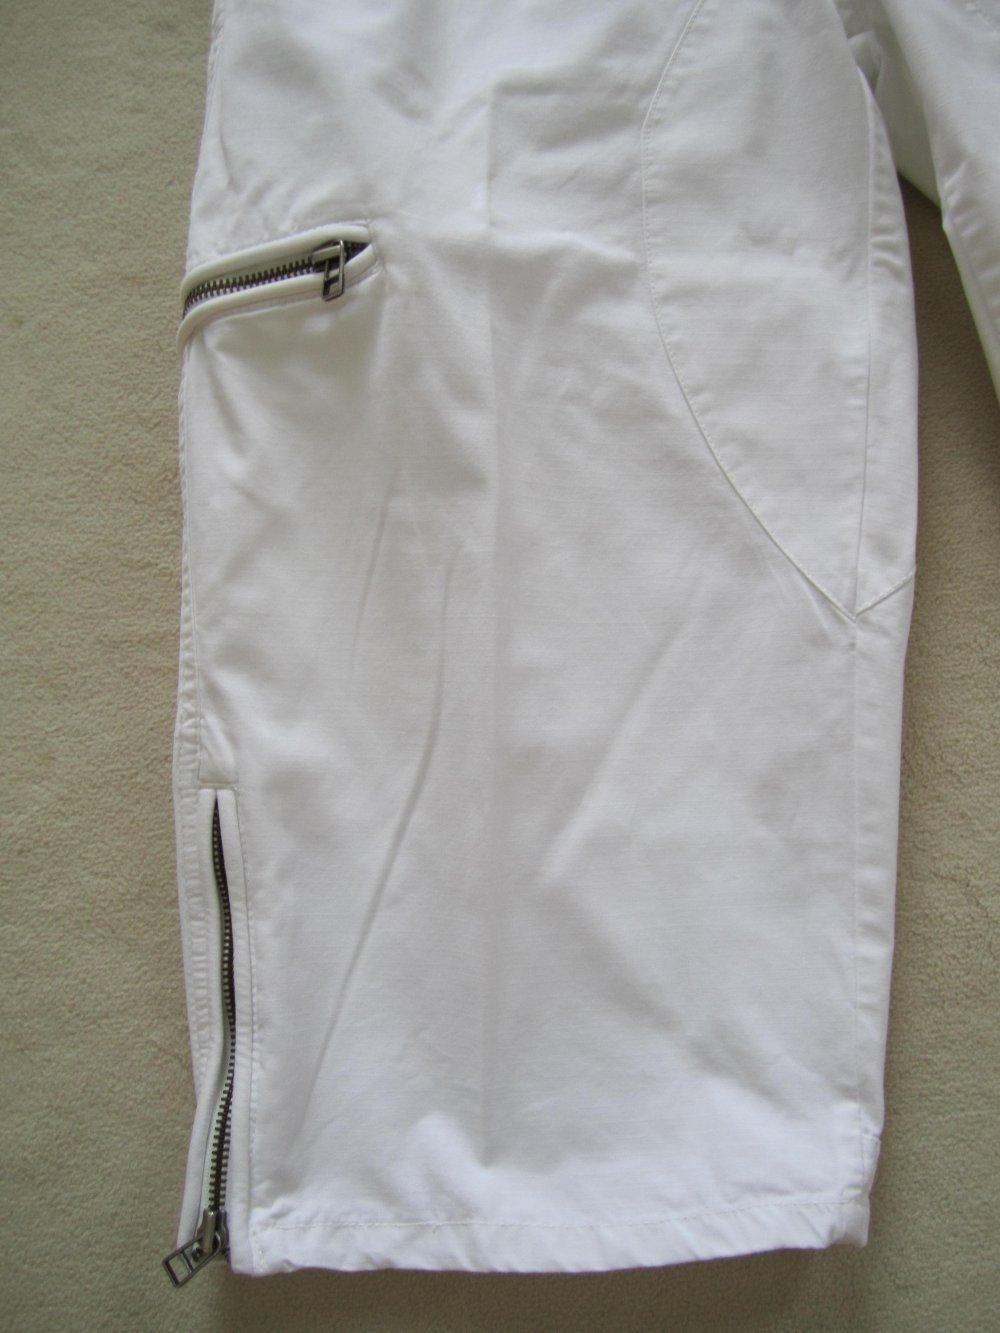 Gigstar - GIGSTAR Herren Bermuda kurze Hose Shorts weiß Gr.32 wie 48 ... 5b3f8bb10a